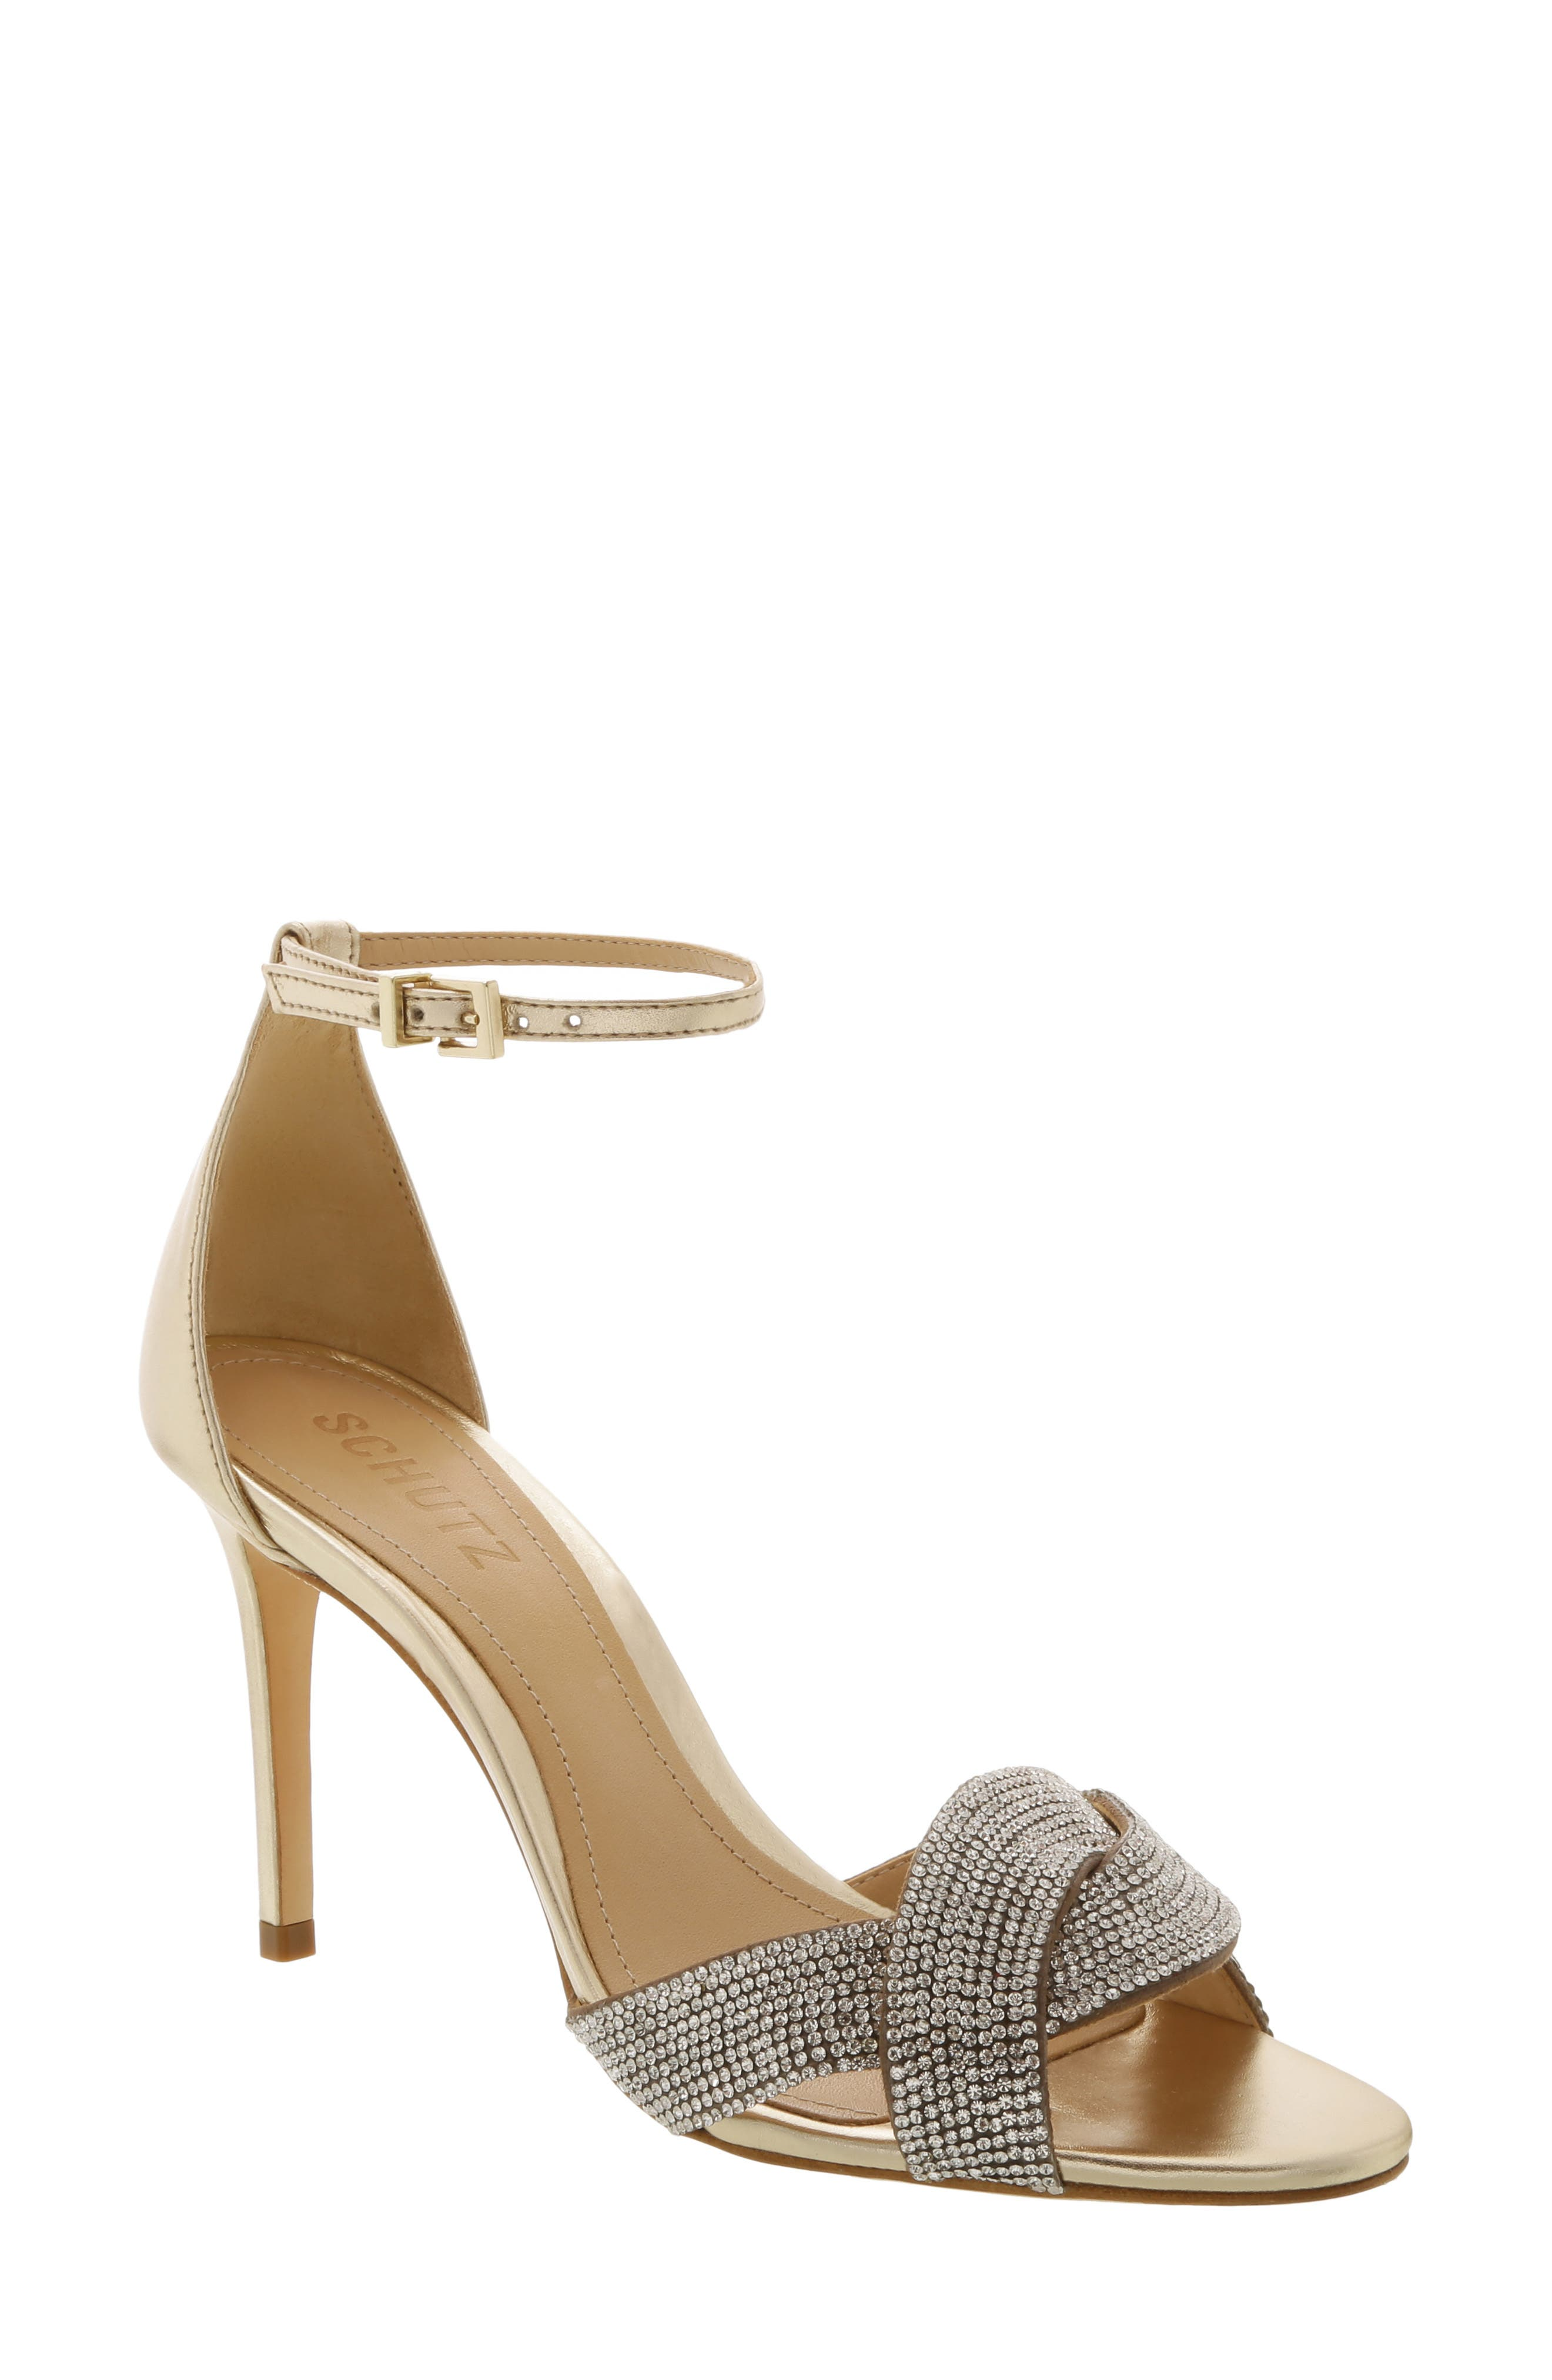 Schutz Jolita Ankle Strap Sandal, Metallic